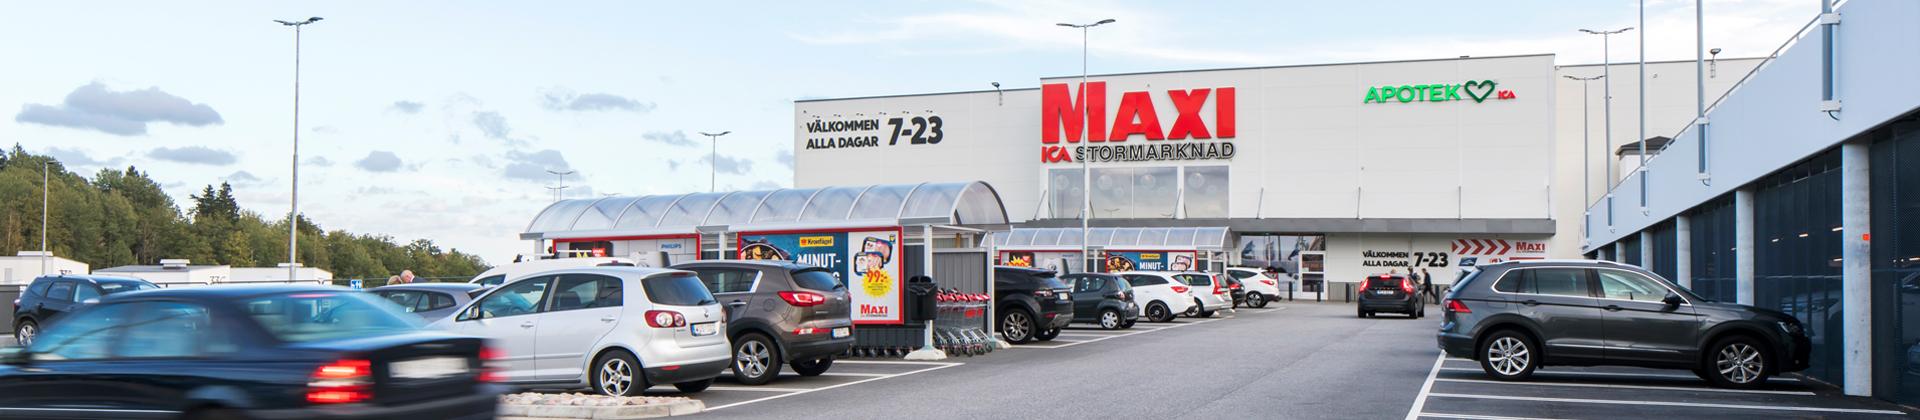 ica maxi södertälje moraberg